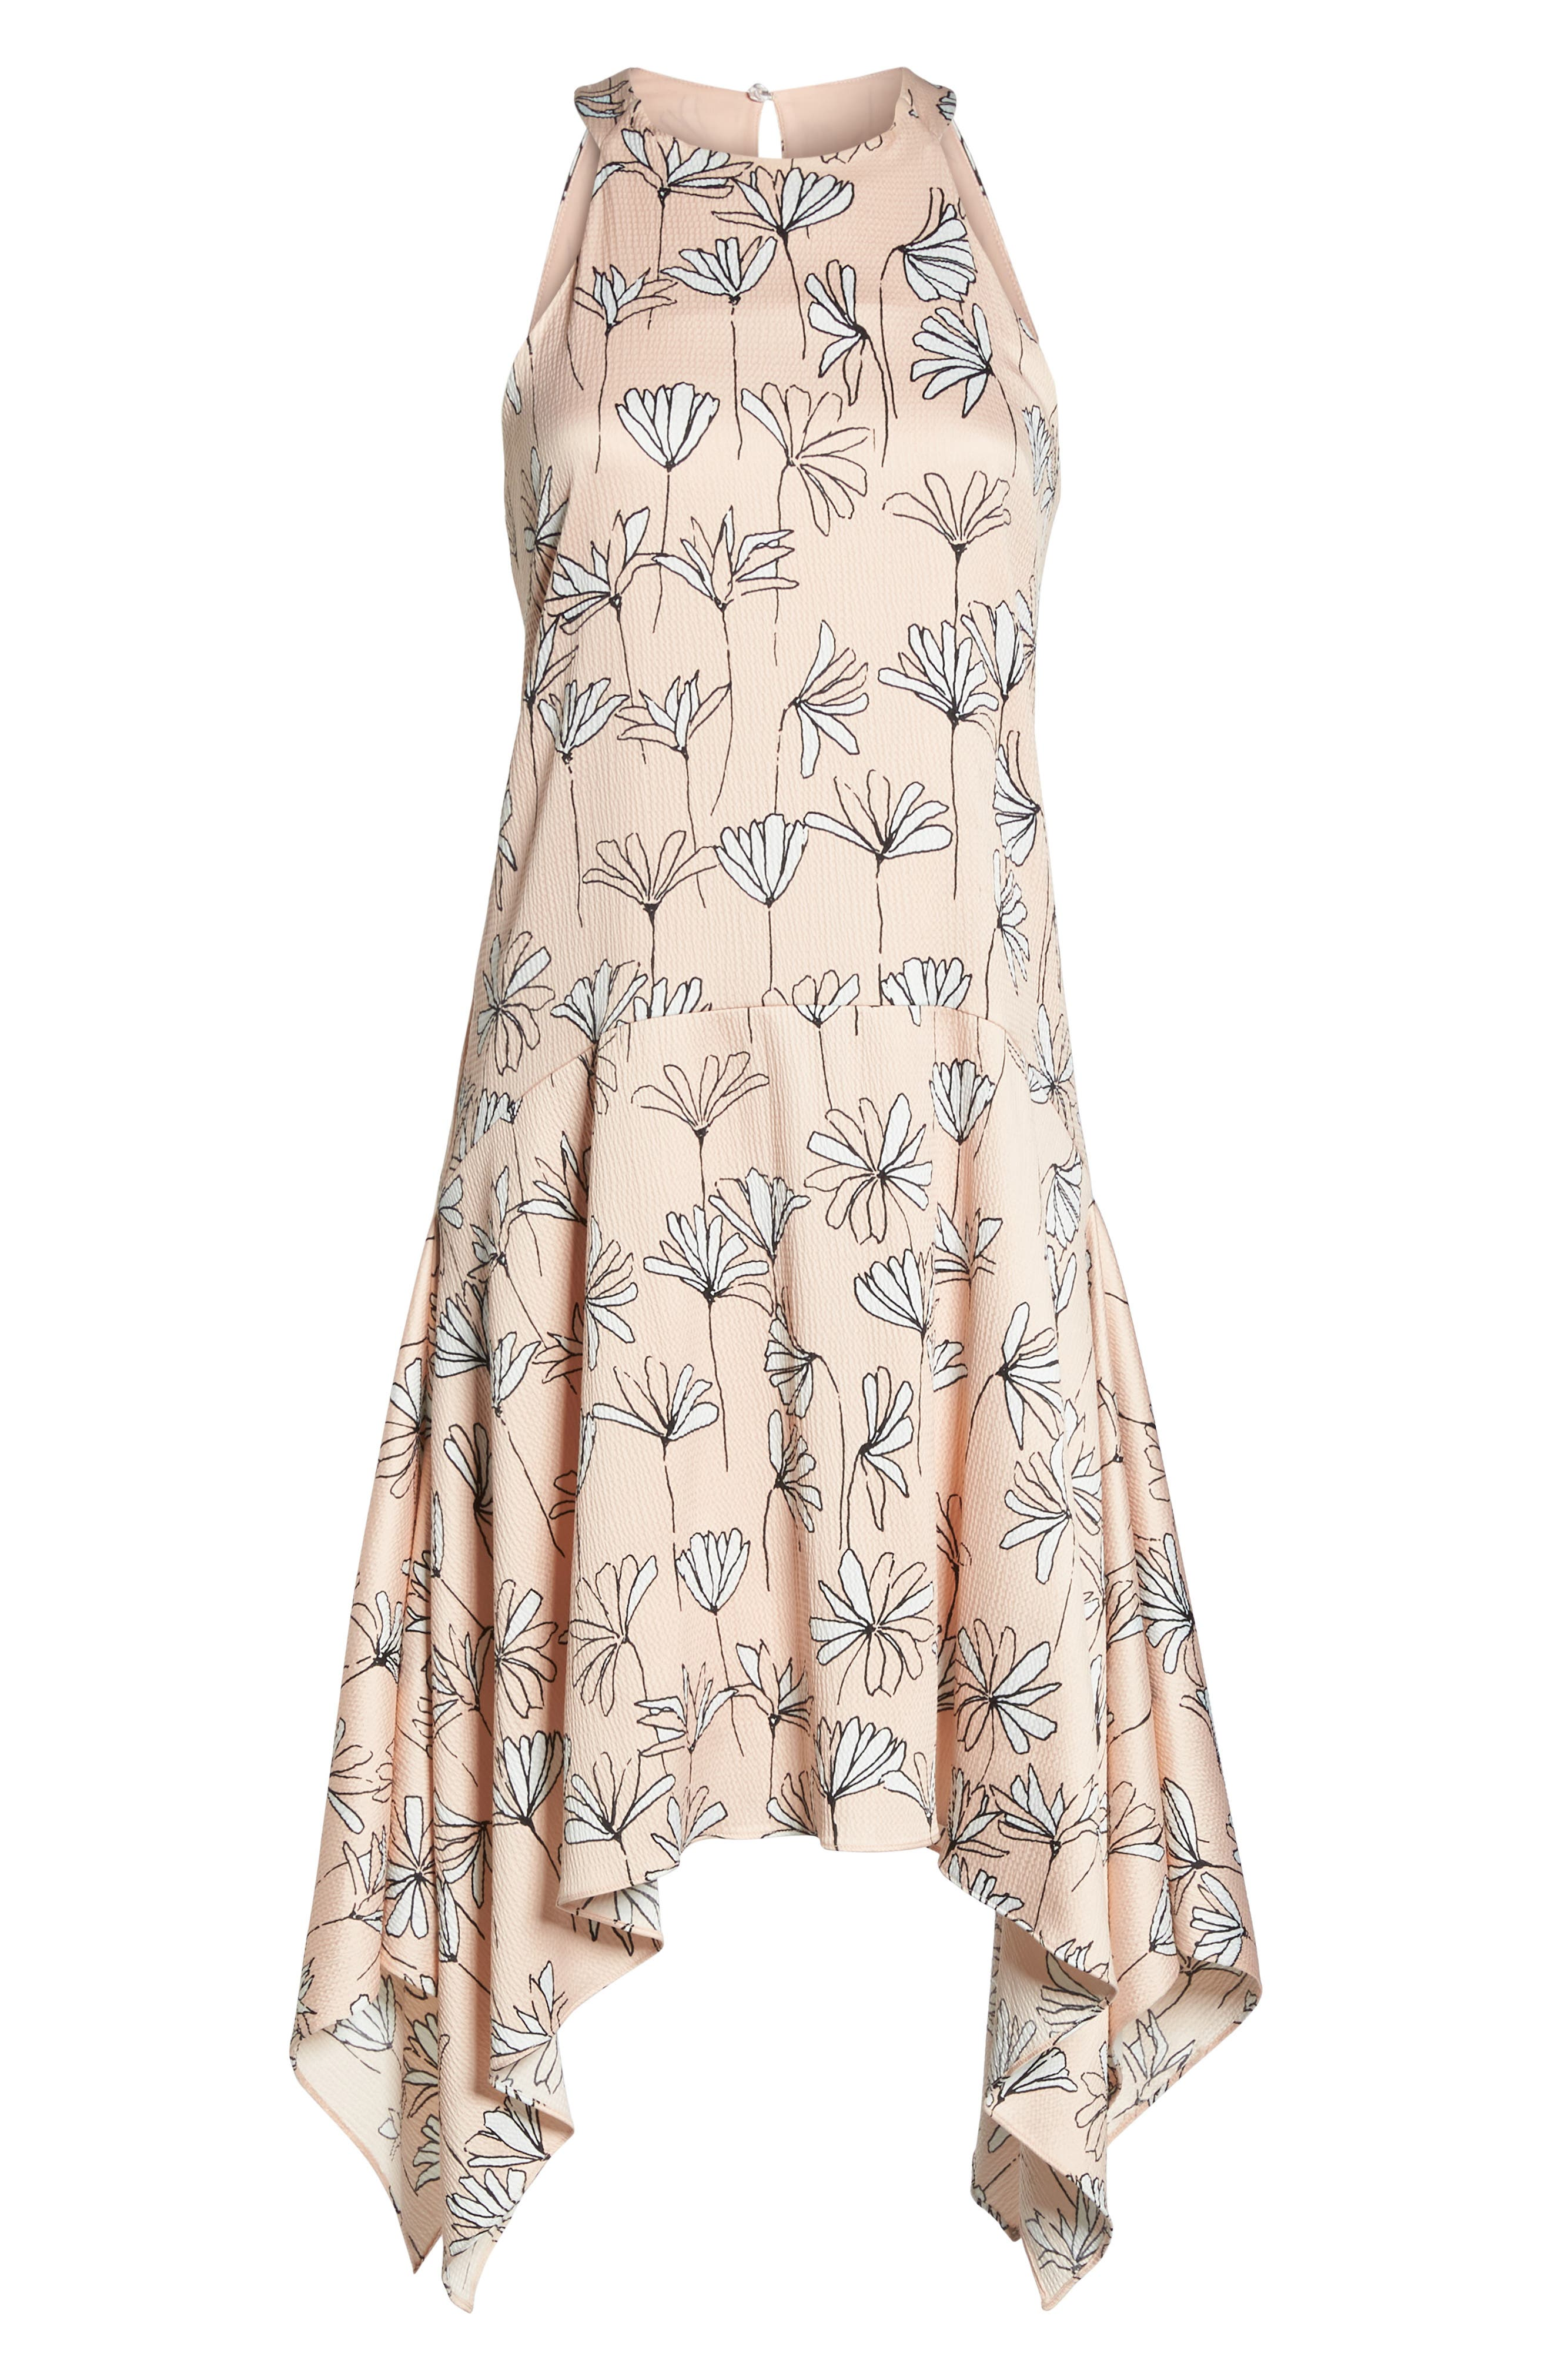 MAGGY LONDON,                             Printed Handkerchief Hem Dress,                             Alternate thumbnail 7, color,                             690